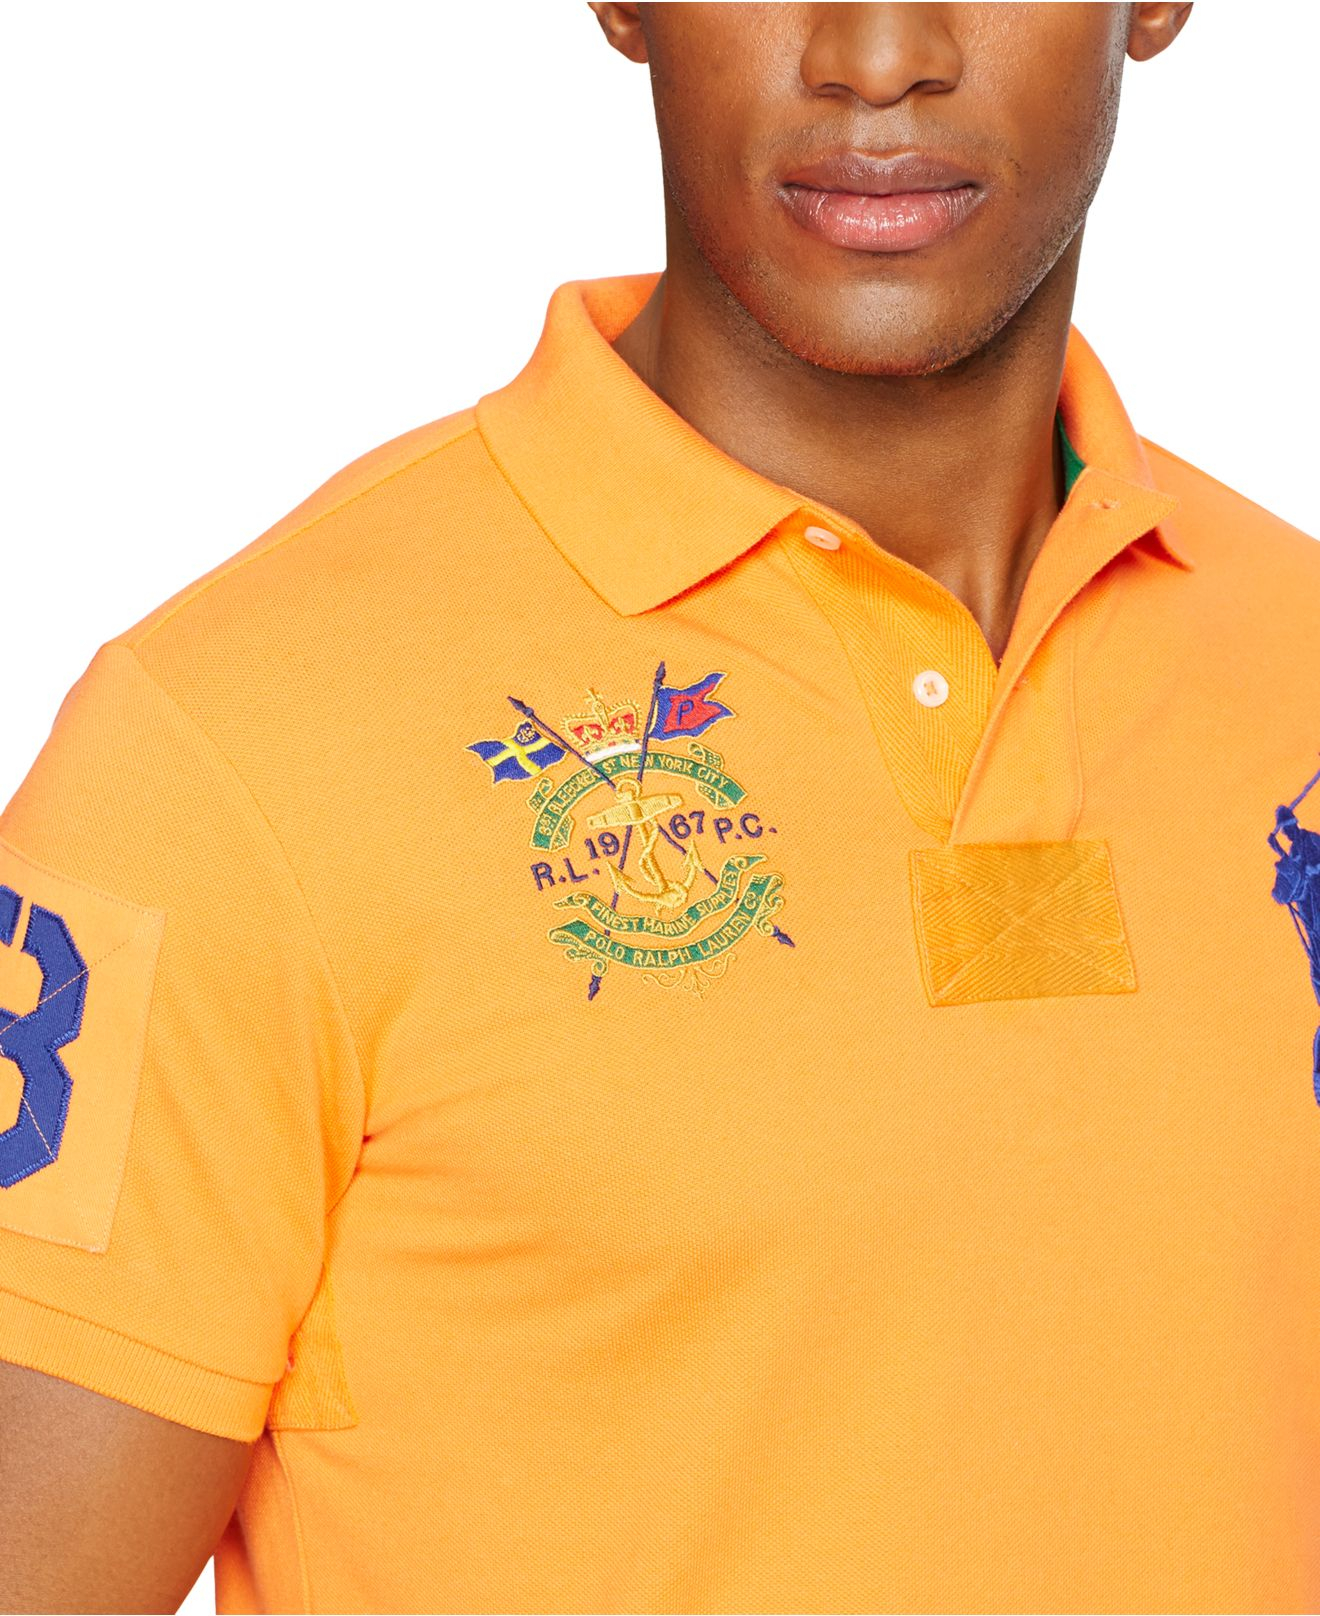 5f3e587591559 Lyst - Polo Ralph Lauren Custom-Fit Big Pony Mesh Polo Shirt in ...